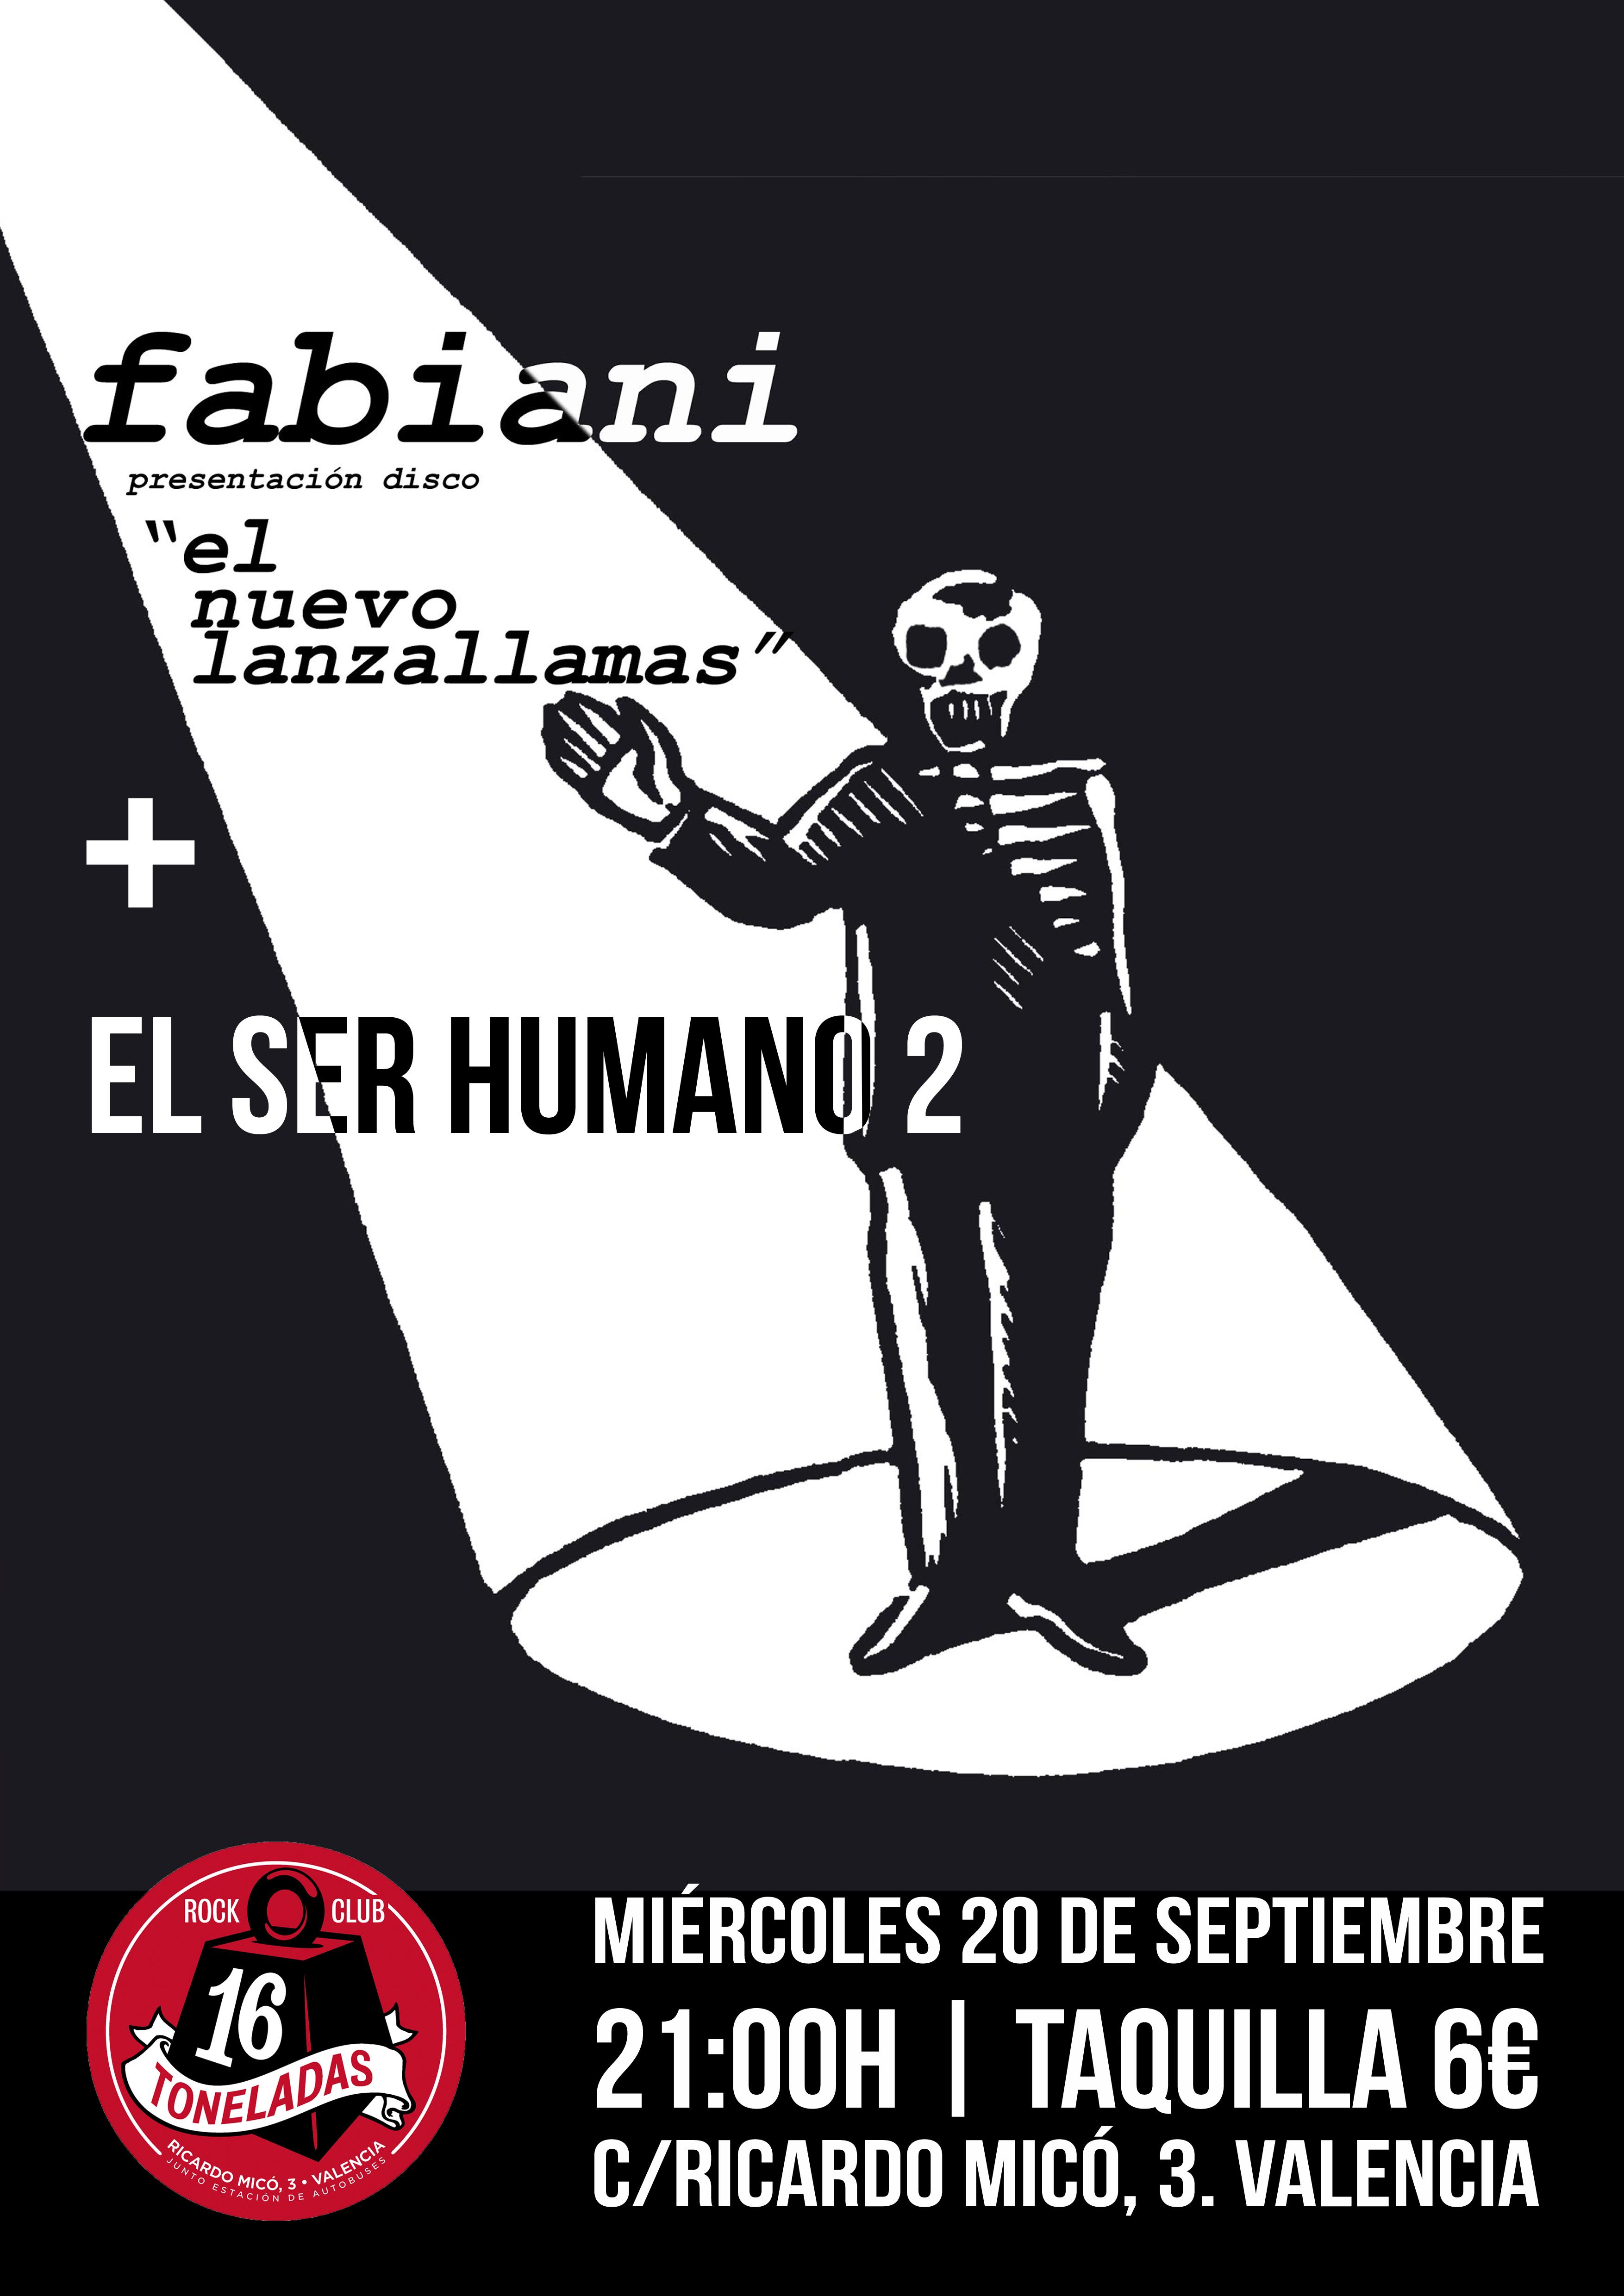 20-x-cartel-fabiani-el-ser-humano-2